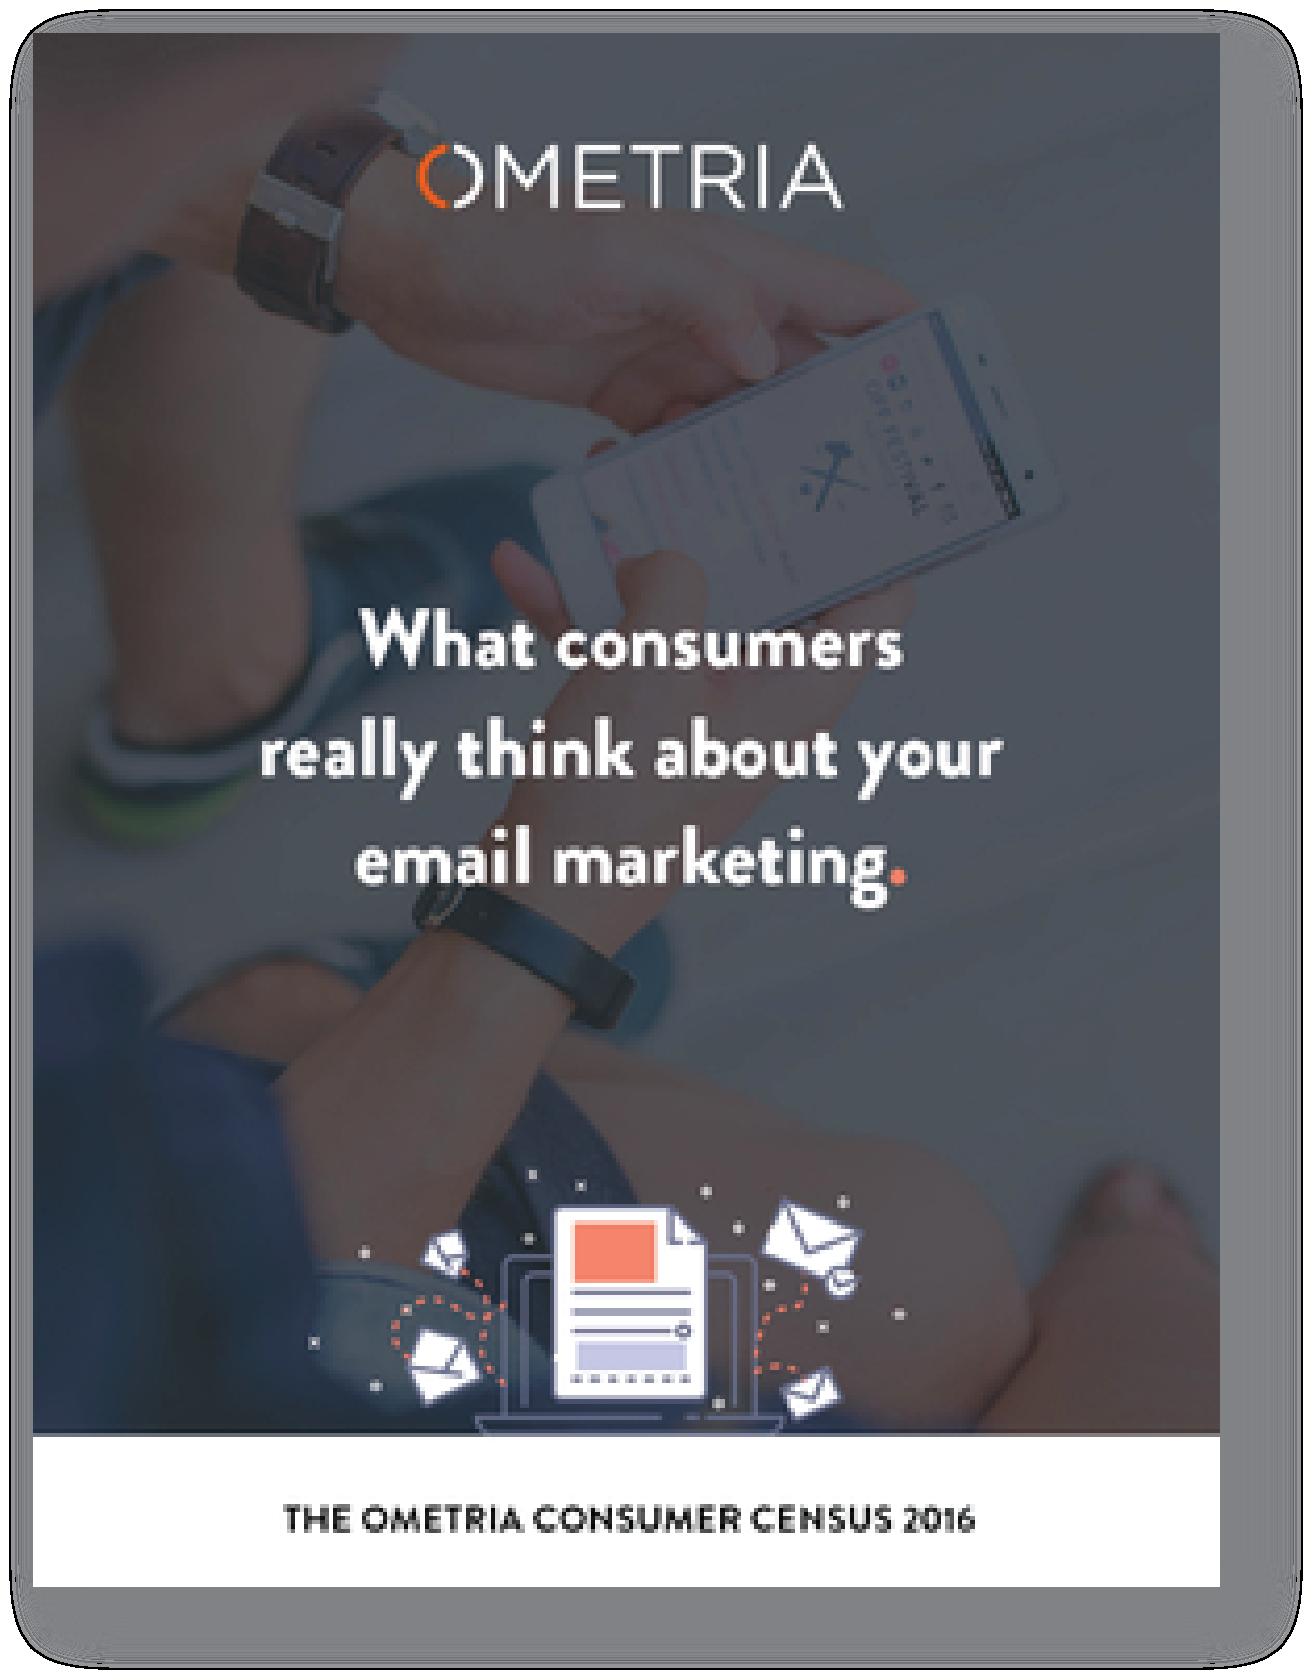 consumer_census_2016-1.png